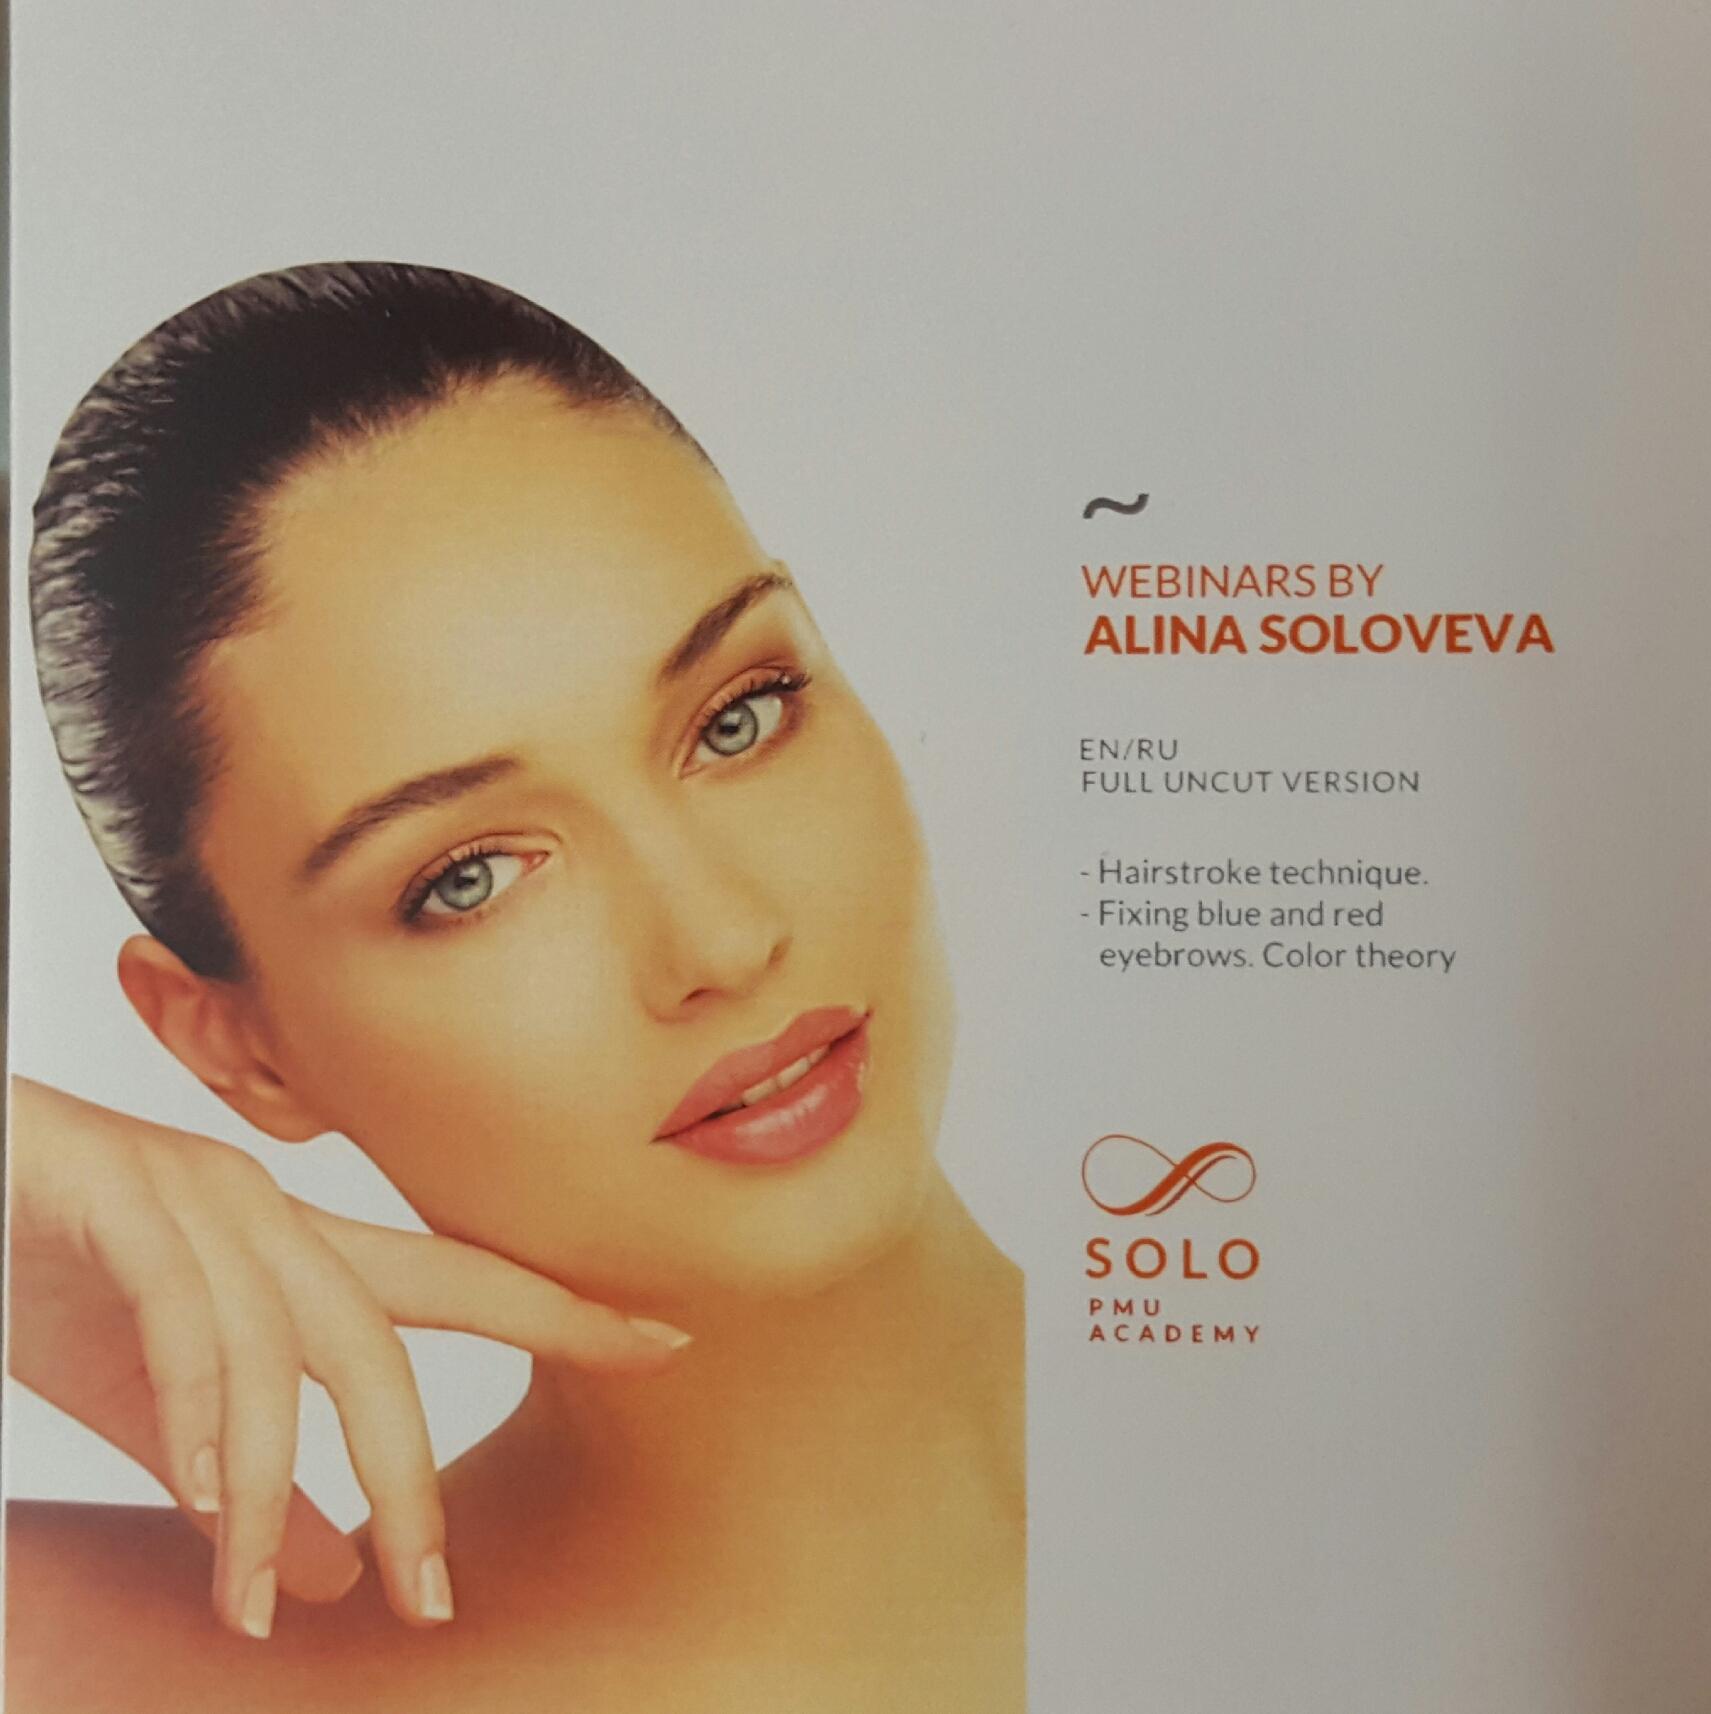 WEBINARS by Alina Soloveva vol.1 DVD